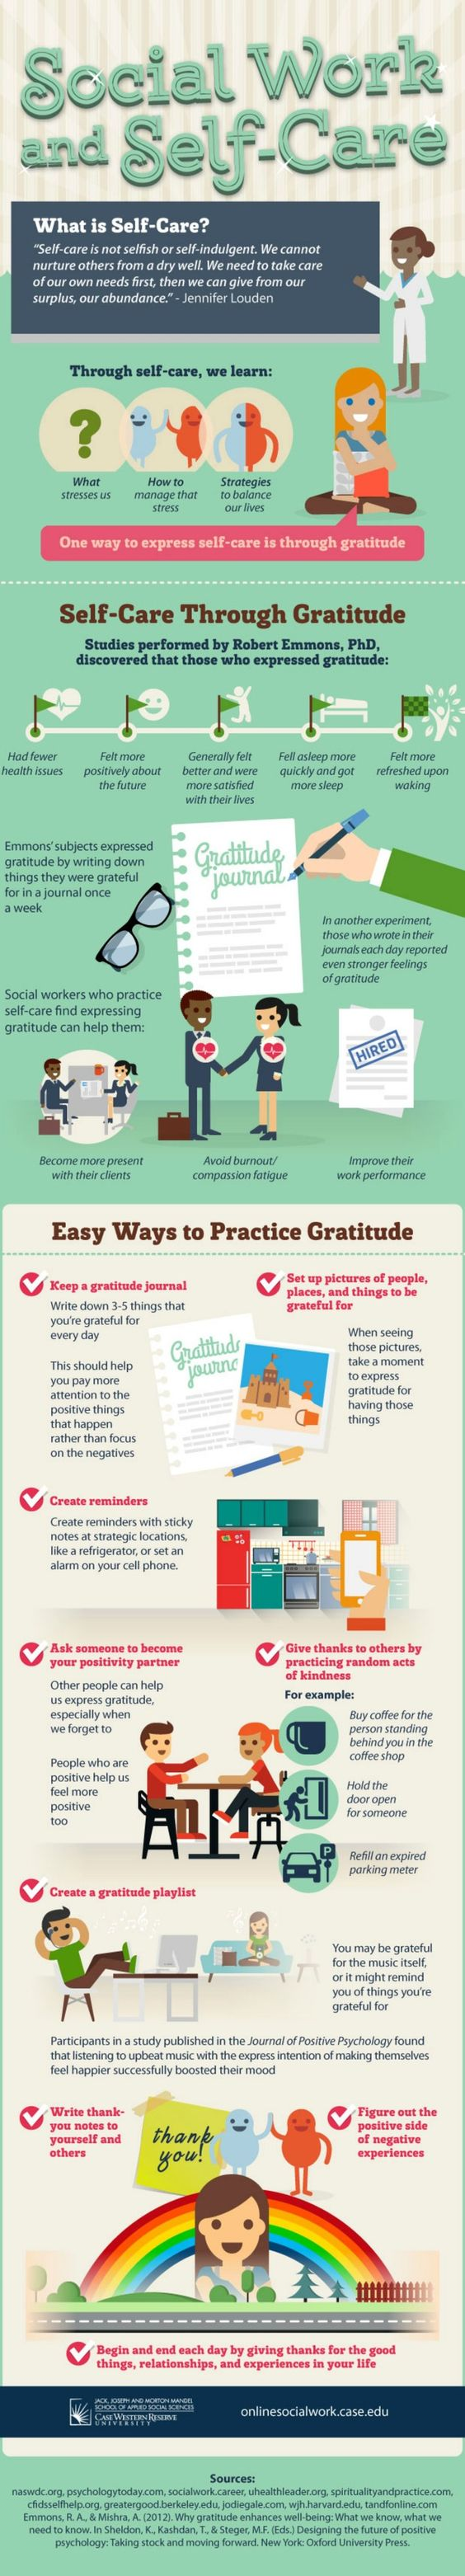 Infographic: Self-Care Through Gratitude http://www.yoganonymous.com/infographic-self-care-through-gratitude via @yoganonymous: